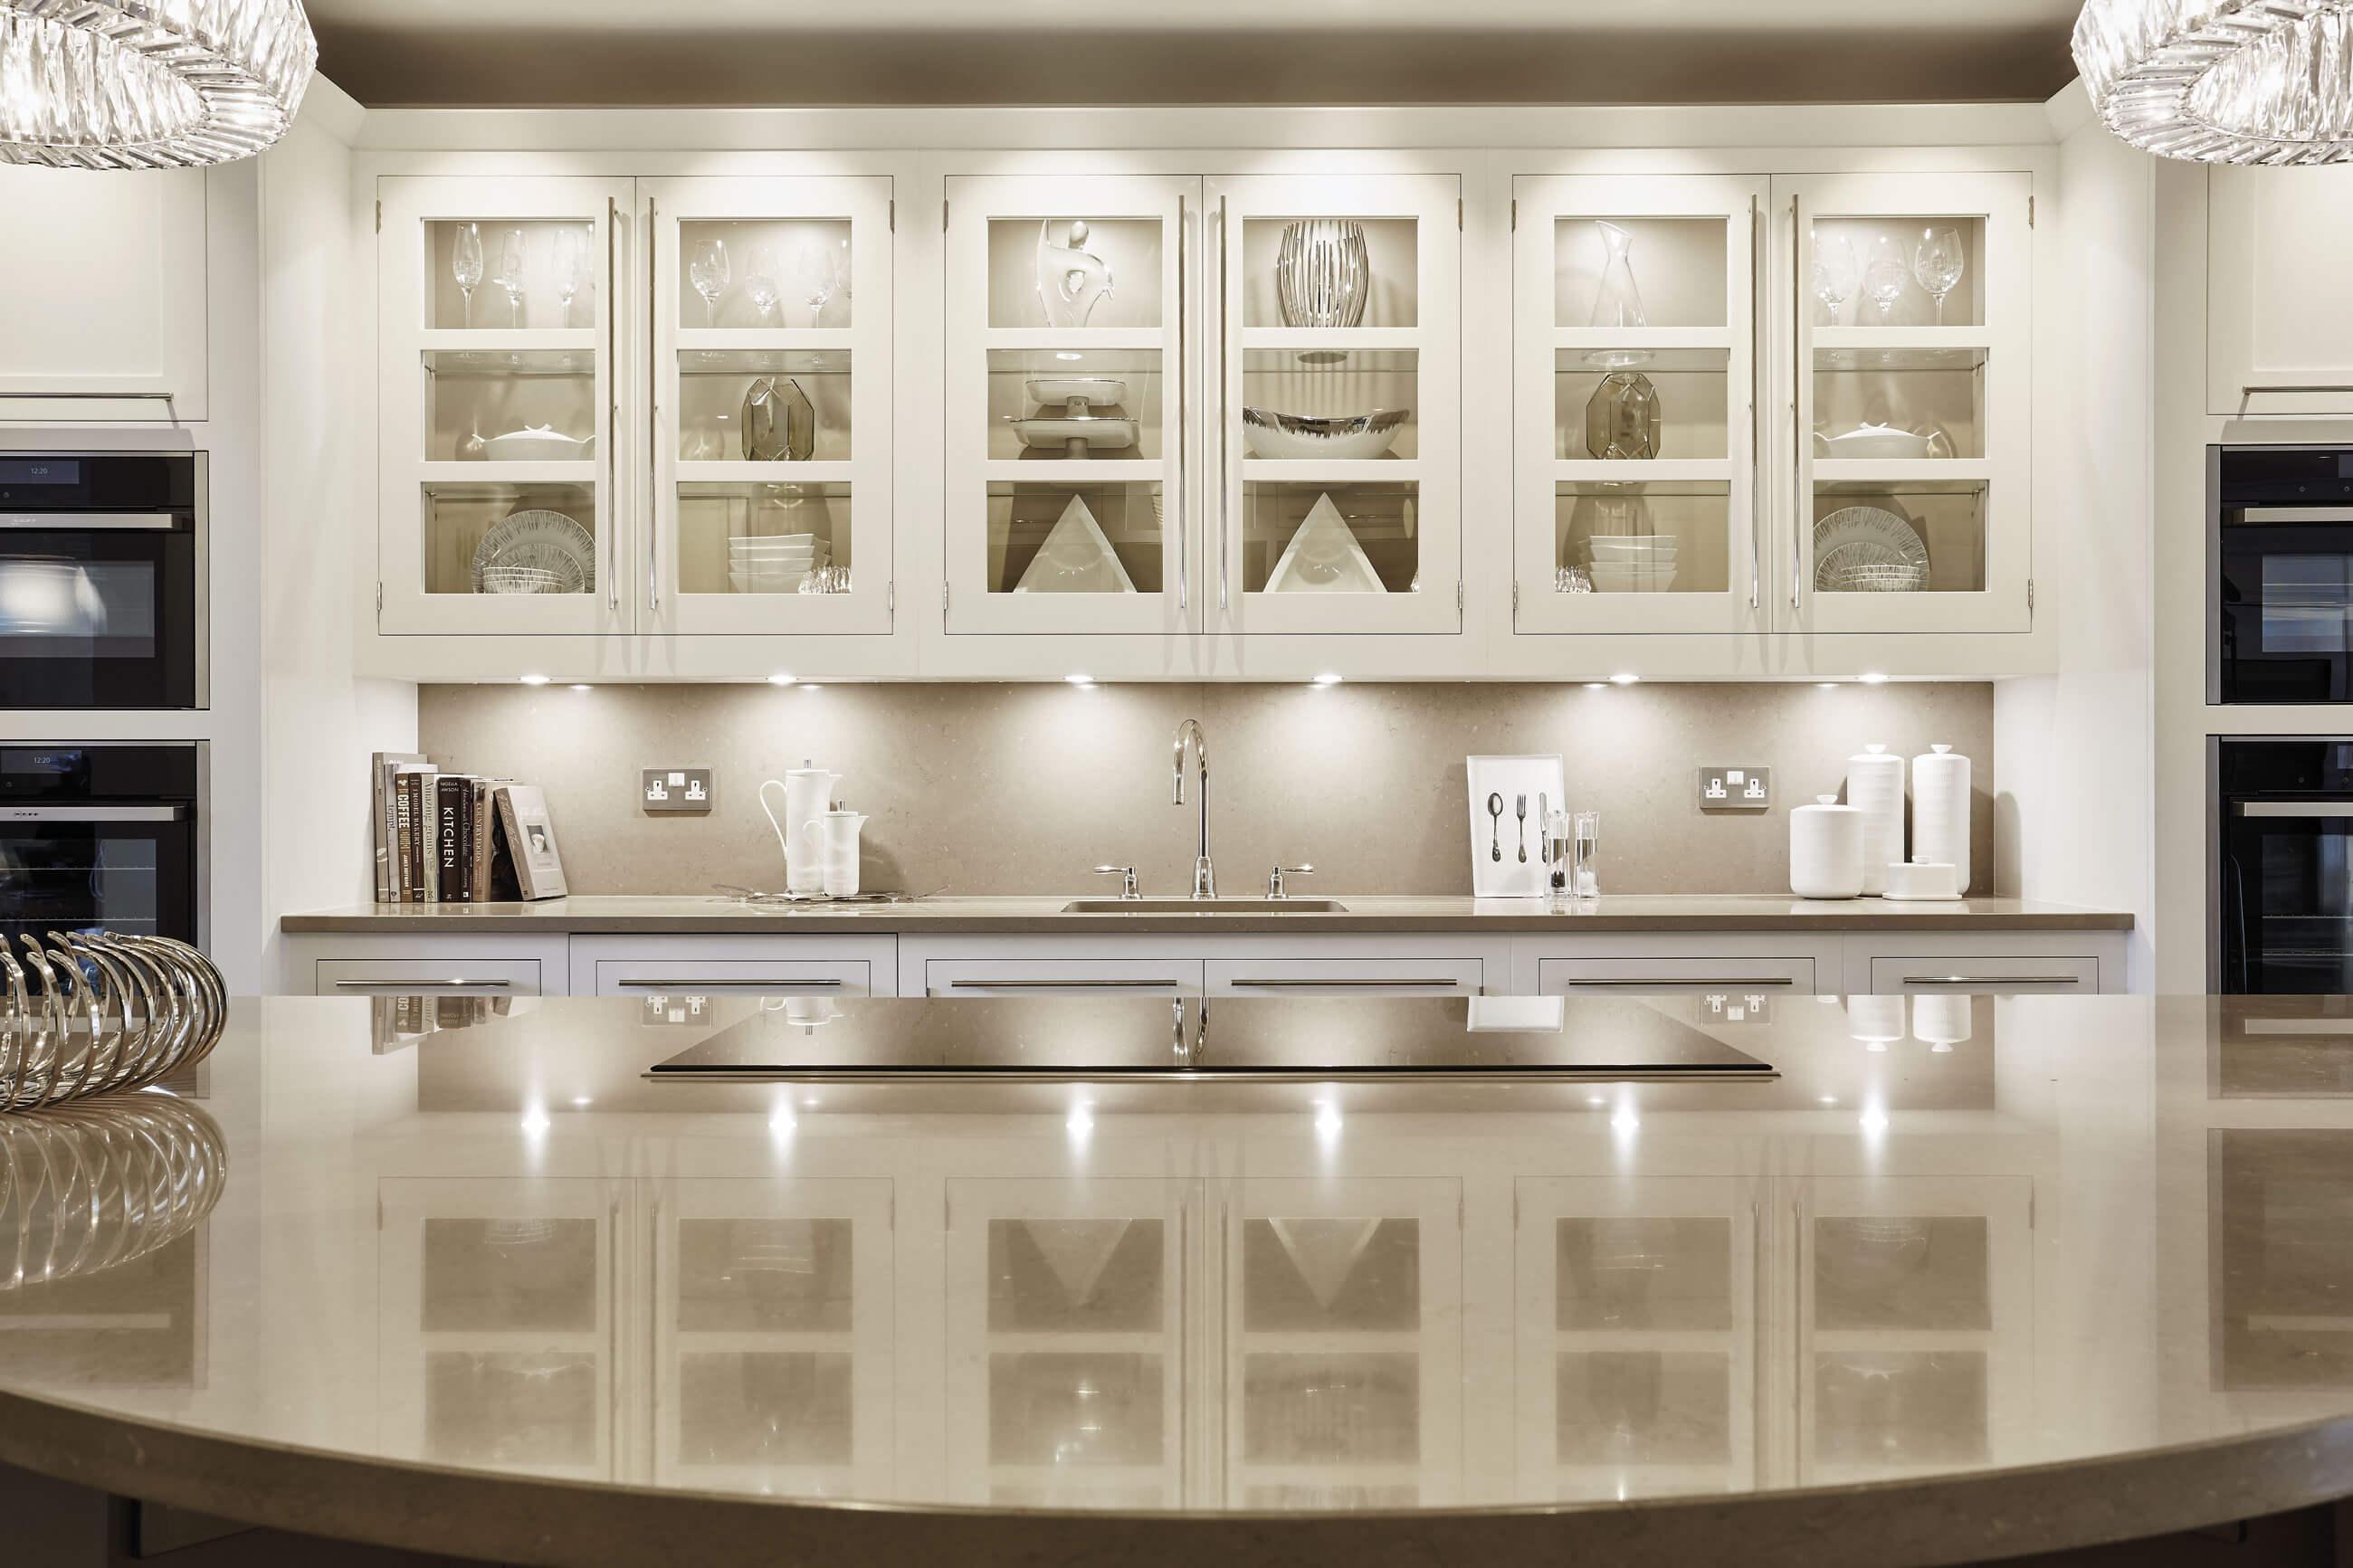 Cream and white kitchen tom howley for Perfect kitchen harrogate menu